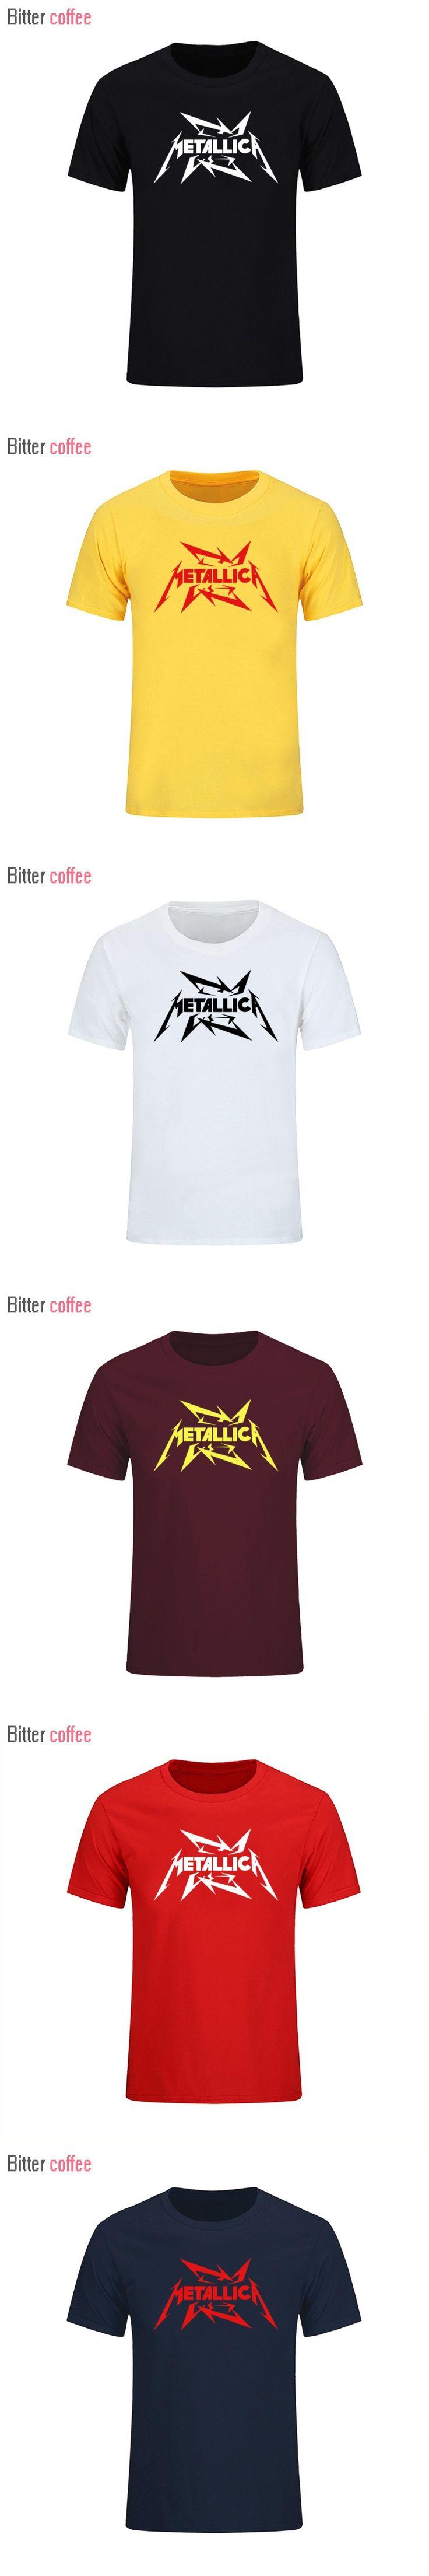 2017 Men's Heavy metal cultivate personality Metallica NIRVANA rock t shirts Funny Novelty hip hop rock t-shirts men T shirt